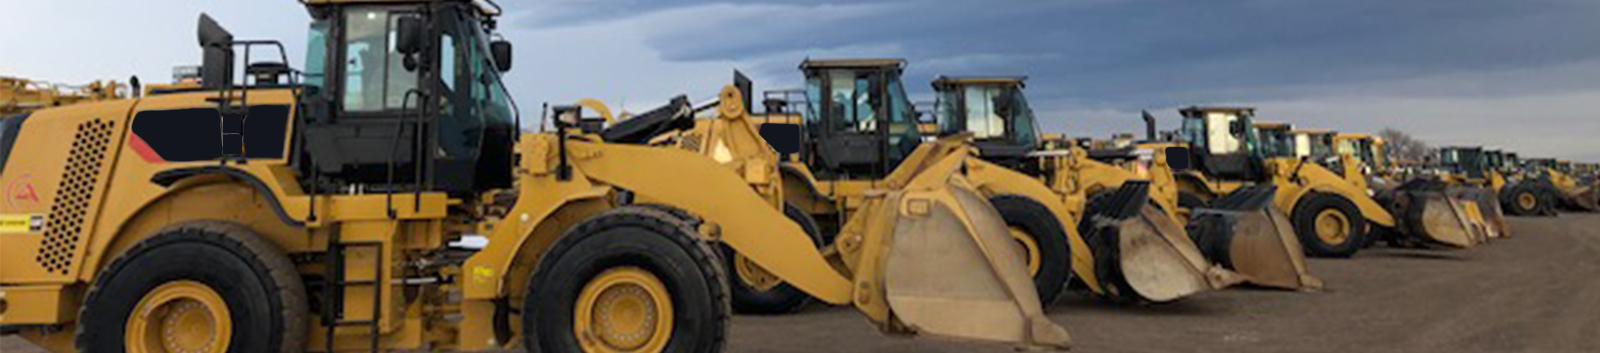 used equipment financing